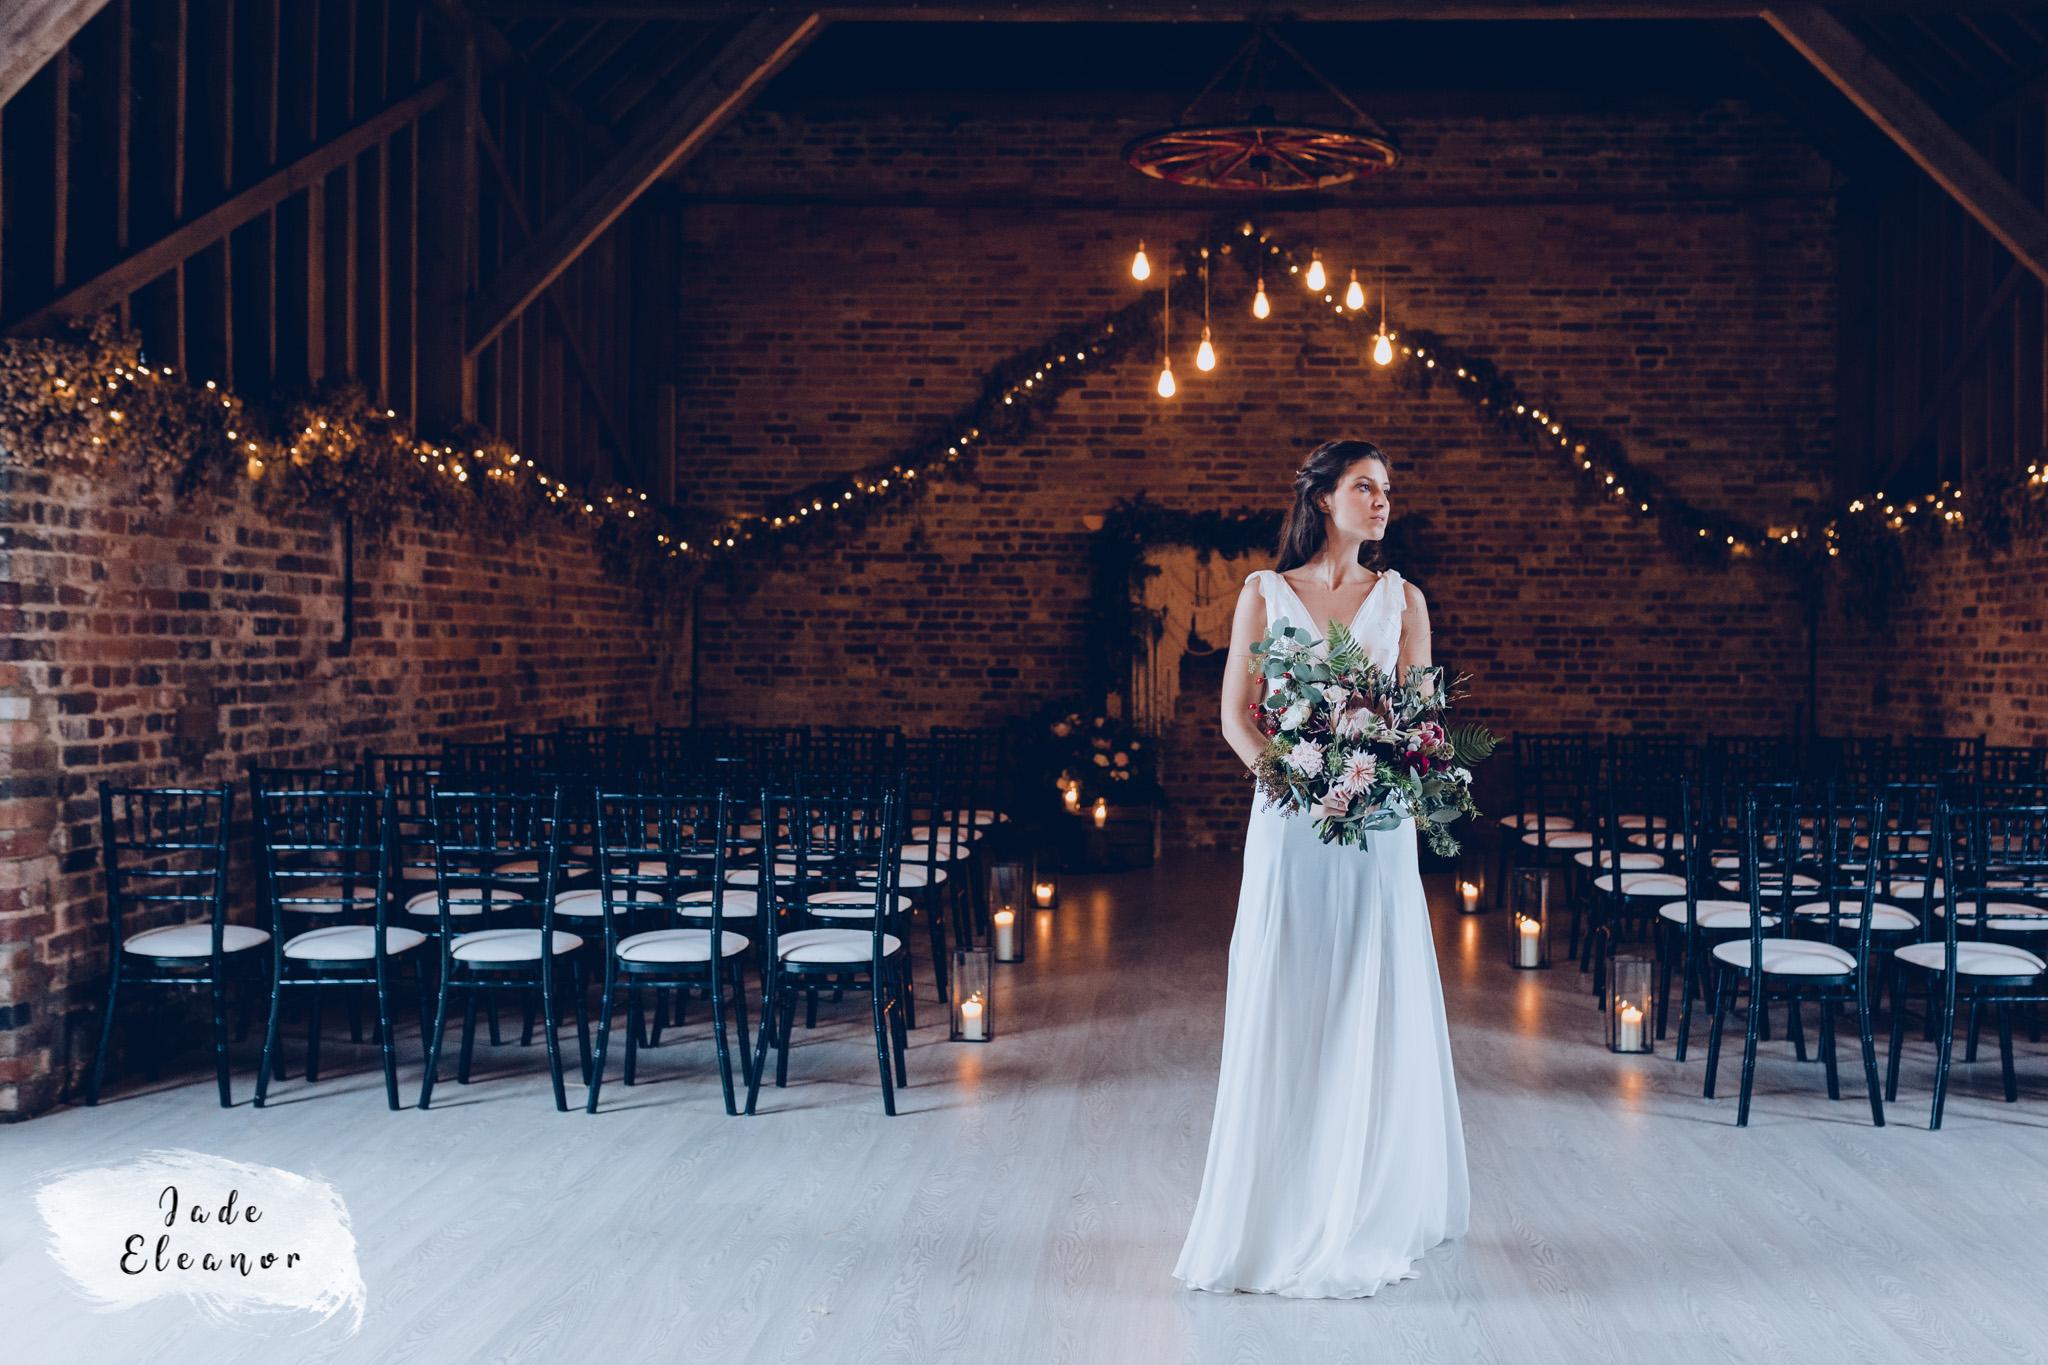 Bysshe Court Barn Wedding Jade Eleanor Photography-3.jpg